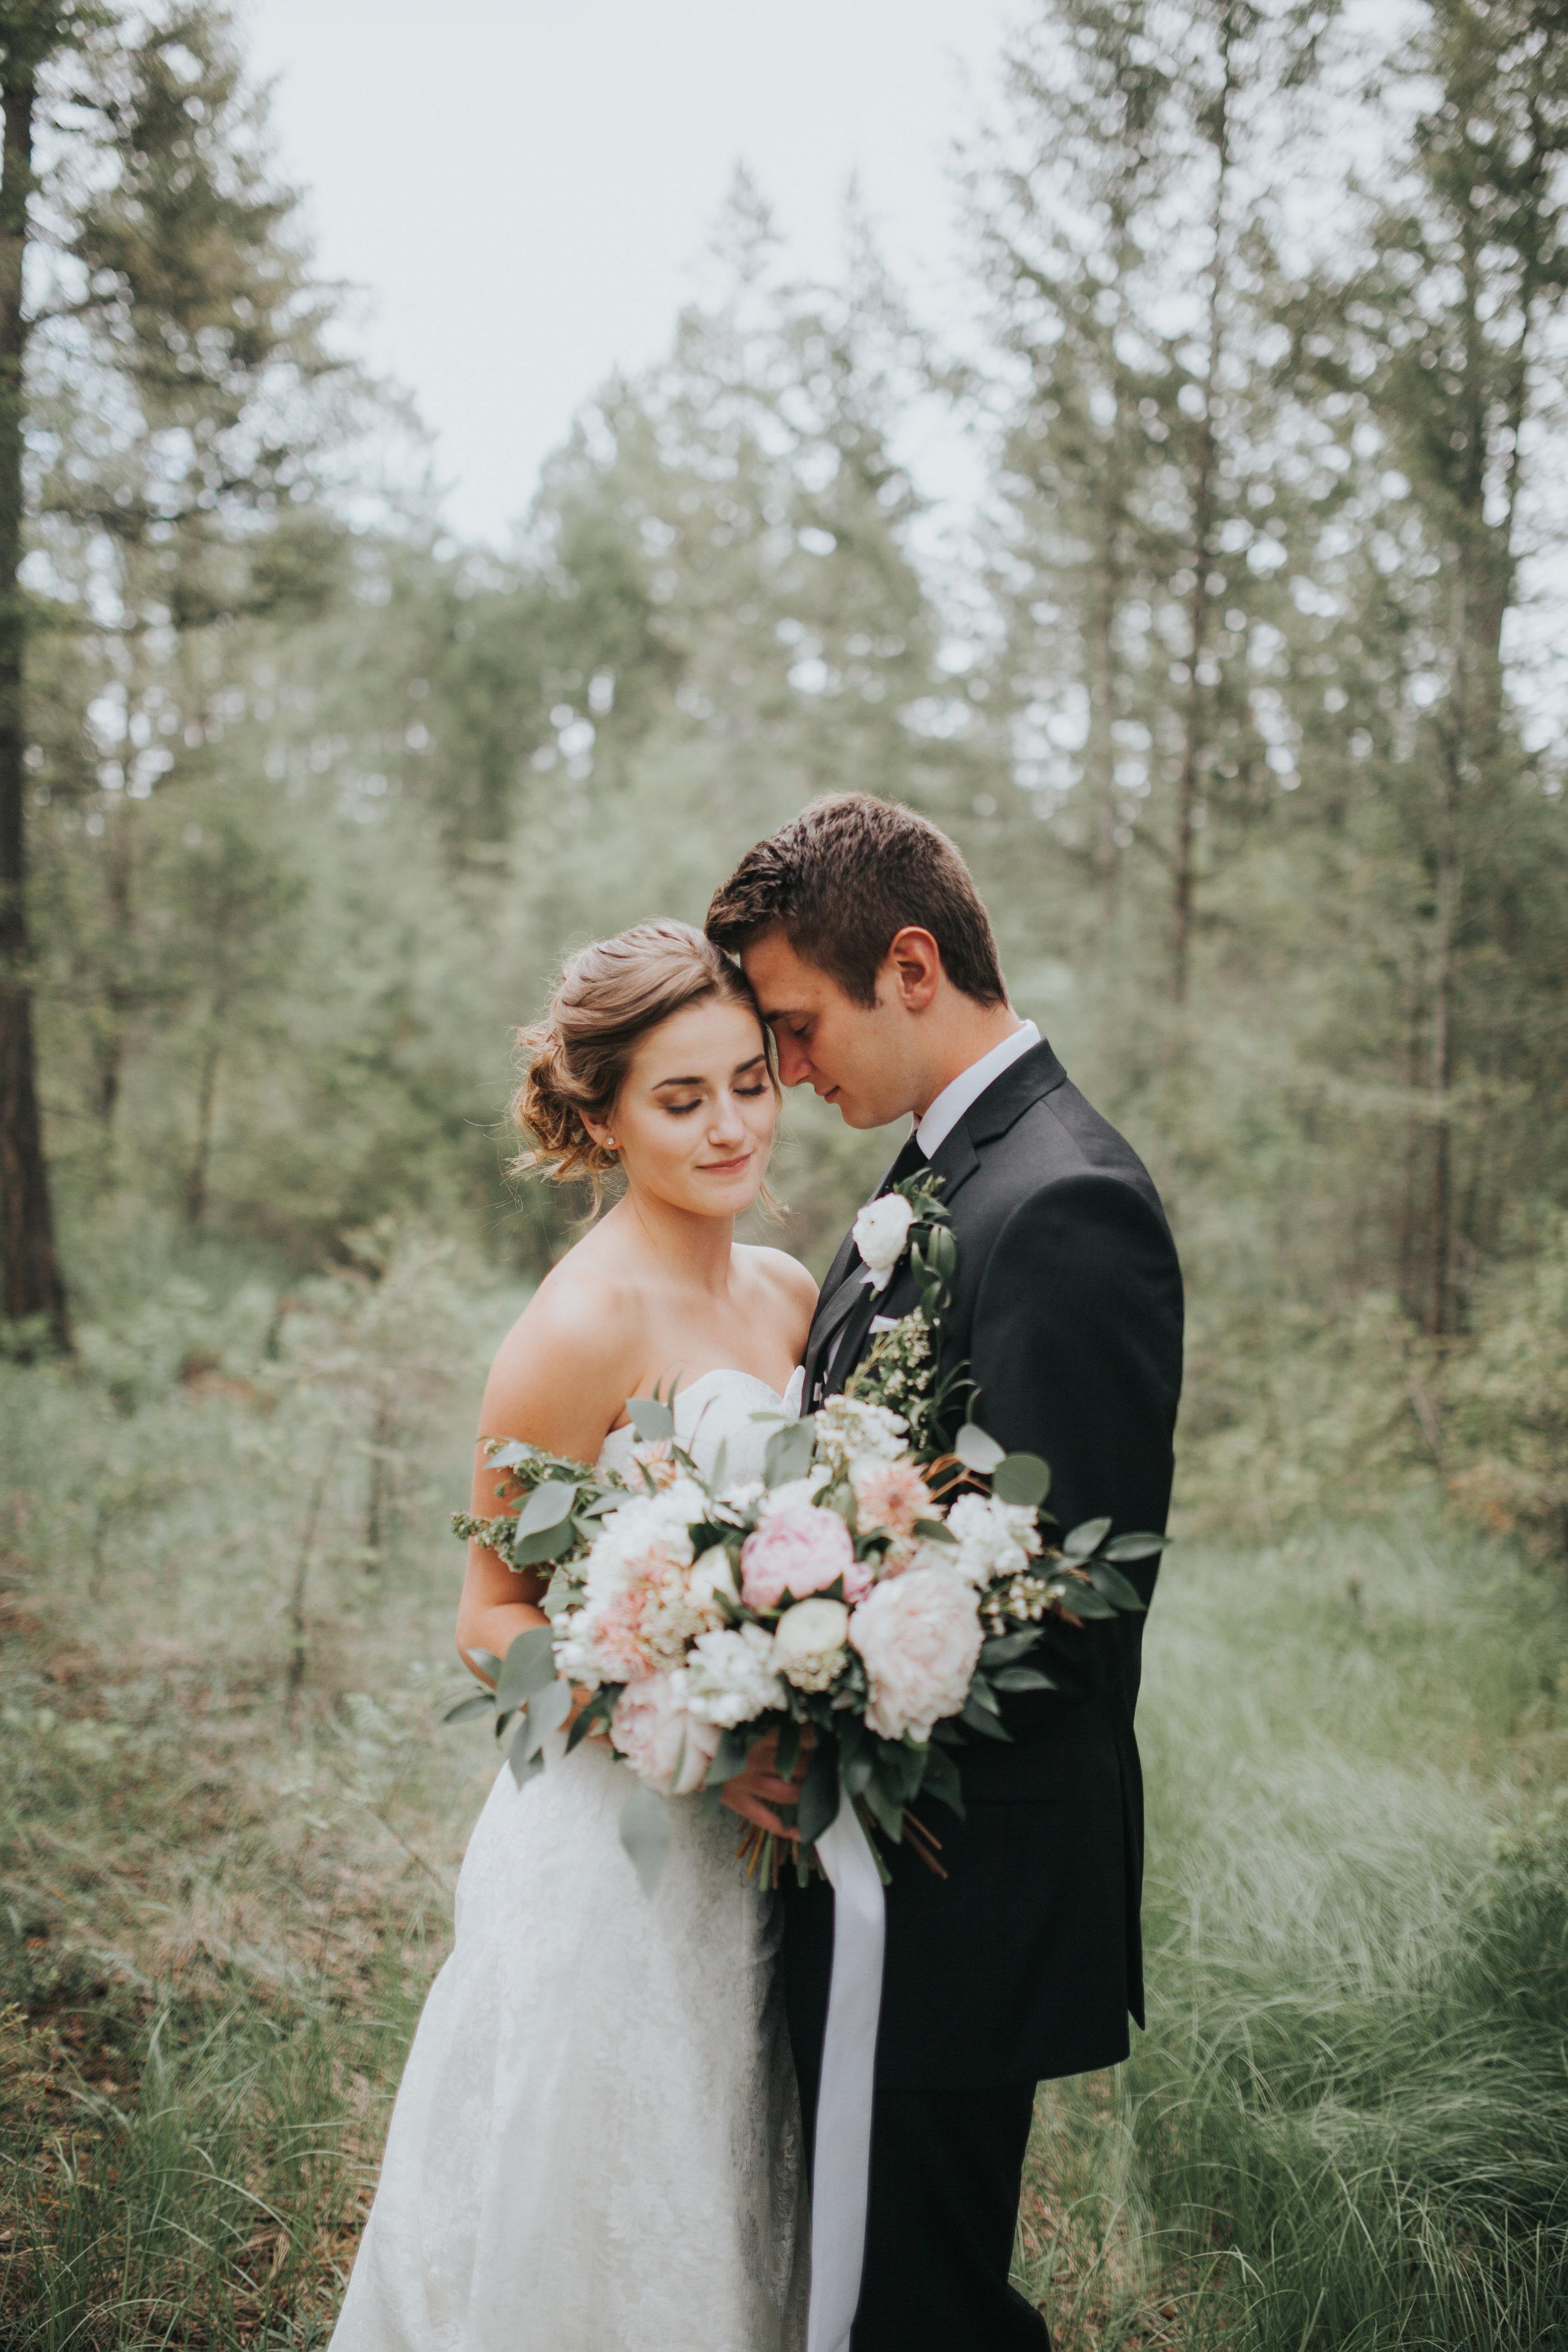 Ryter 4 - Bridal Portraits-126.jpg